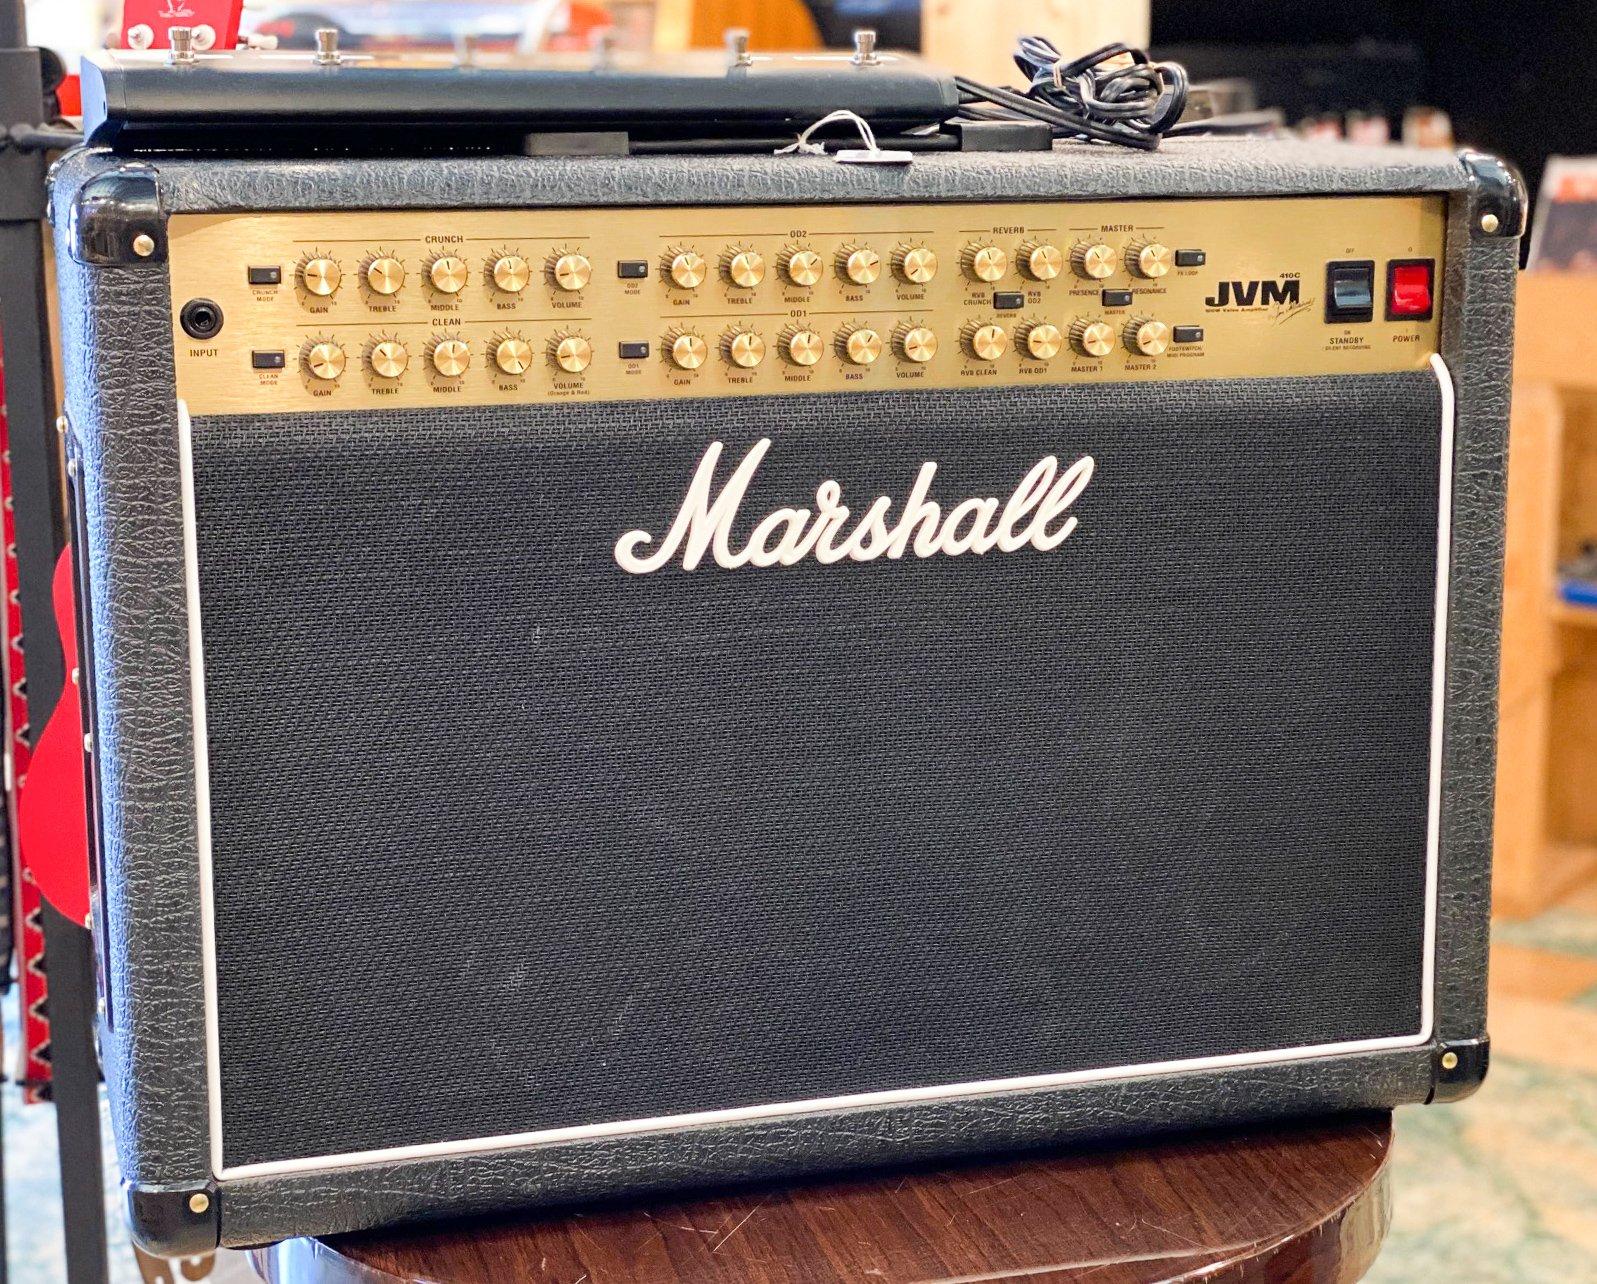 Marshall JVM 410C 2x12 combo w/Celestion Neo Creambacks